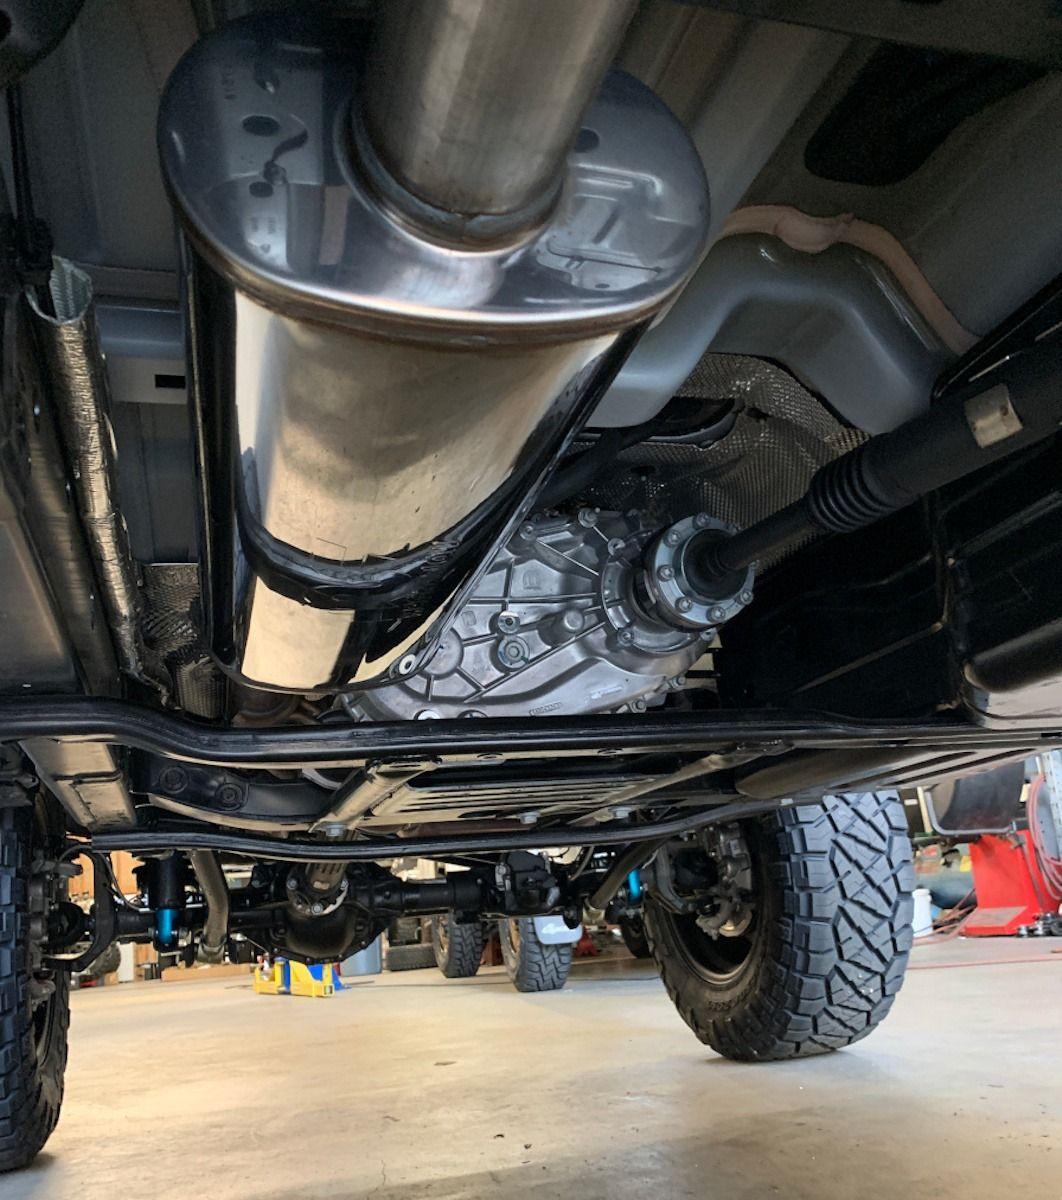 2020 Jeep Gladiator Jt Magnaflow Exhaust Jeep Gladiator Jeep Monster Trucks